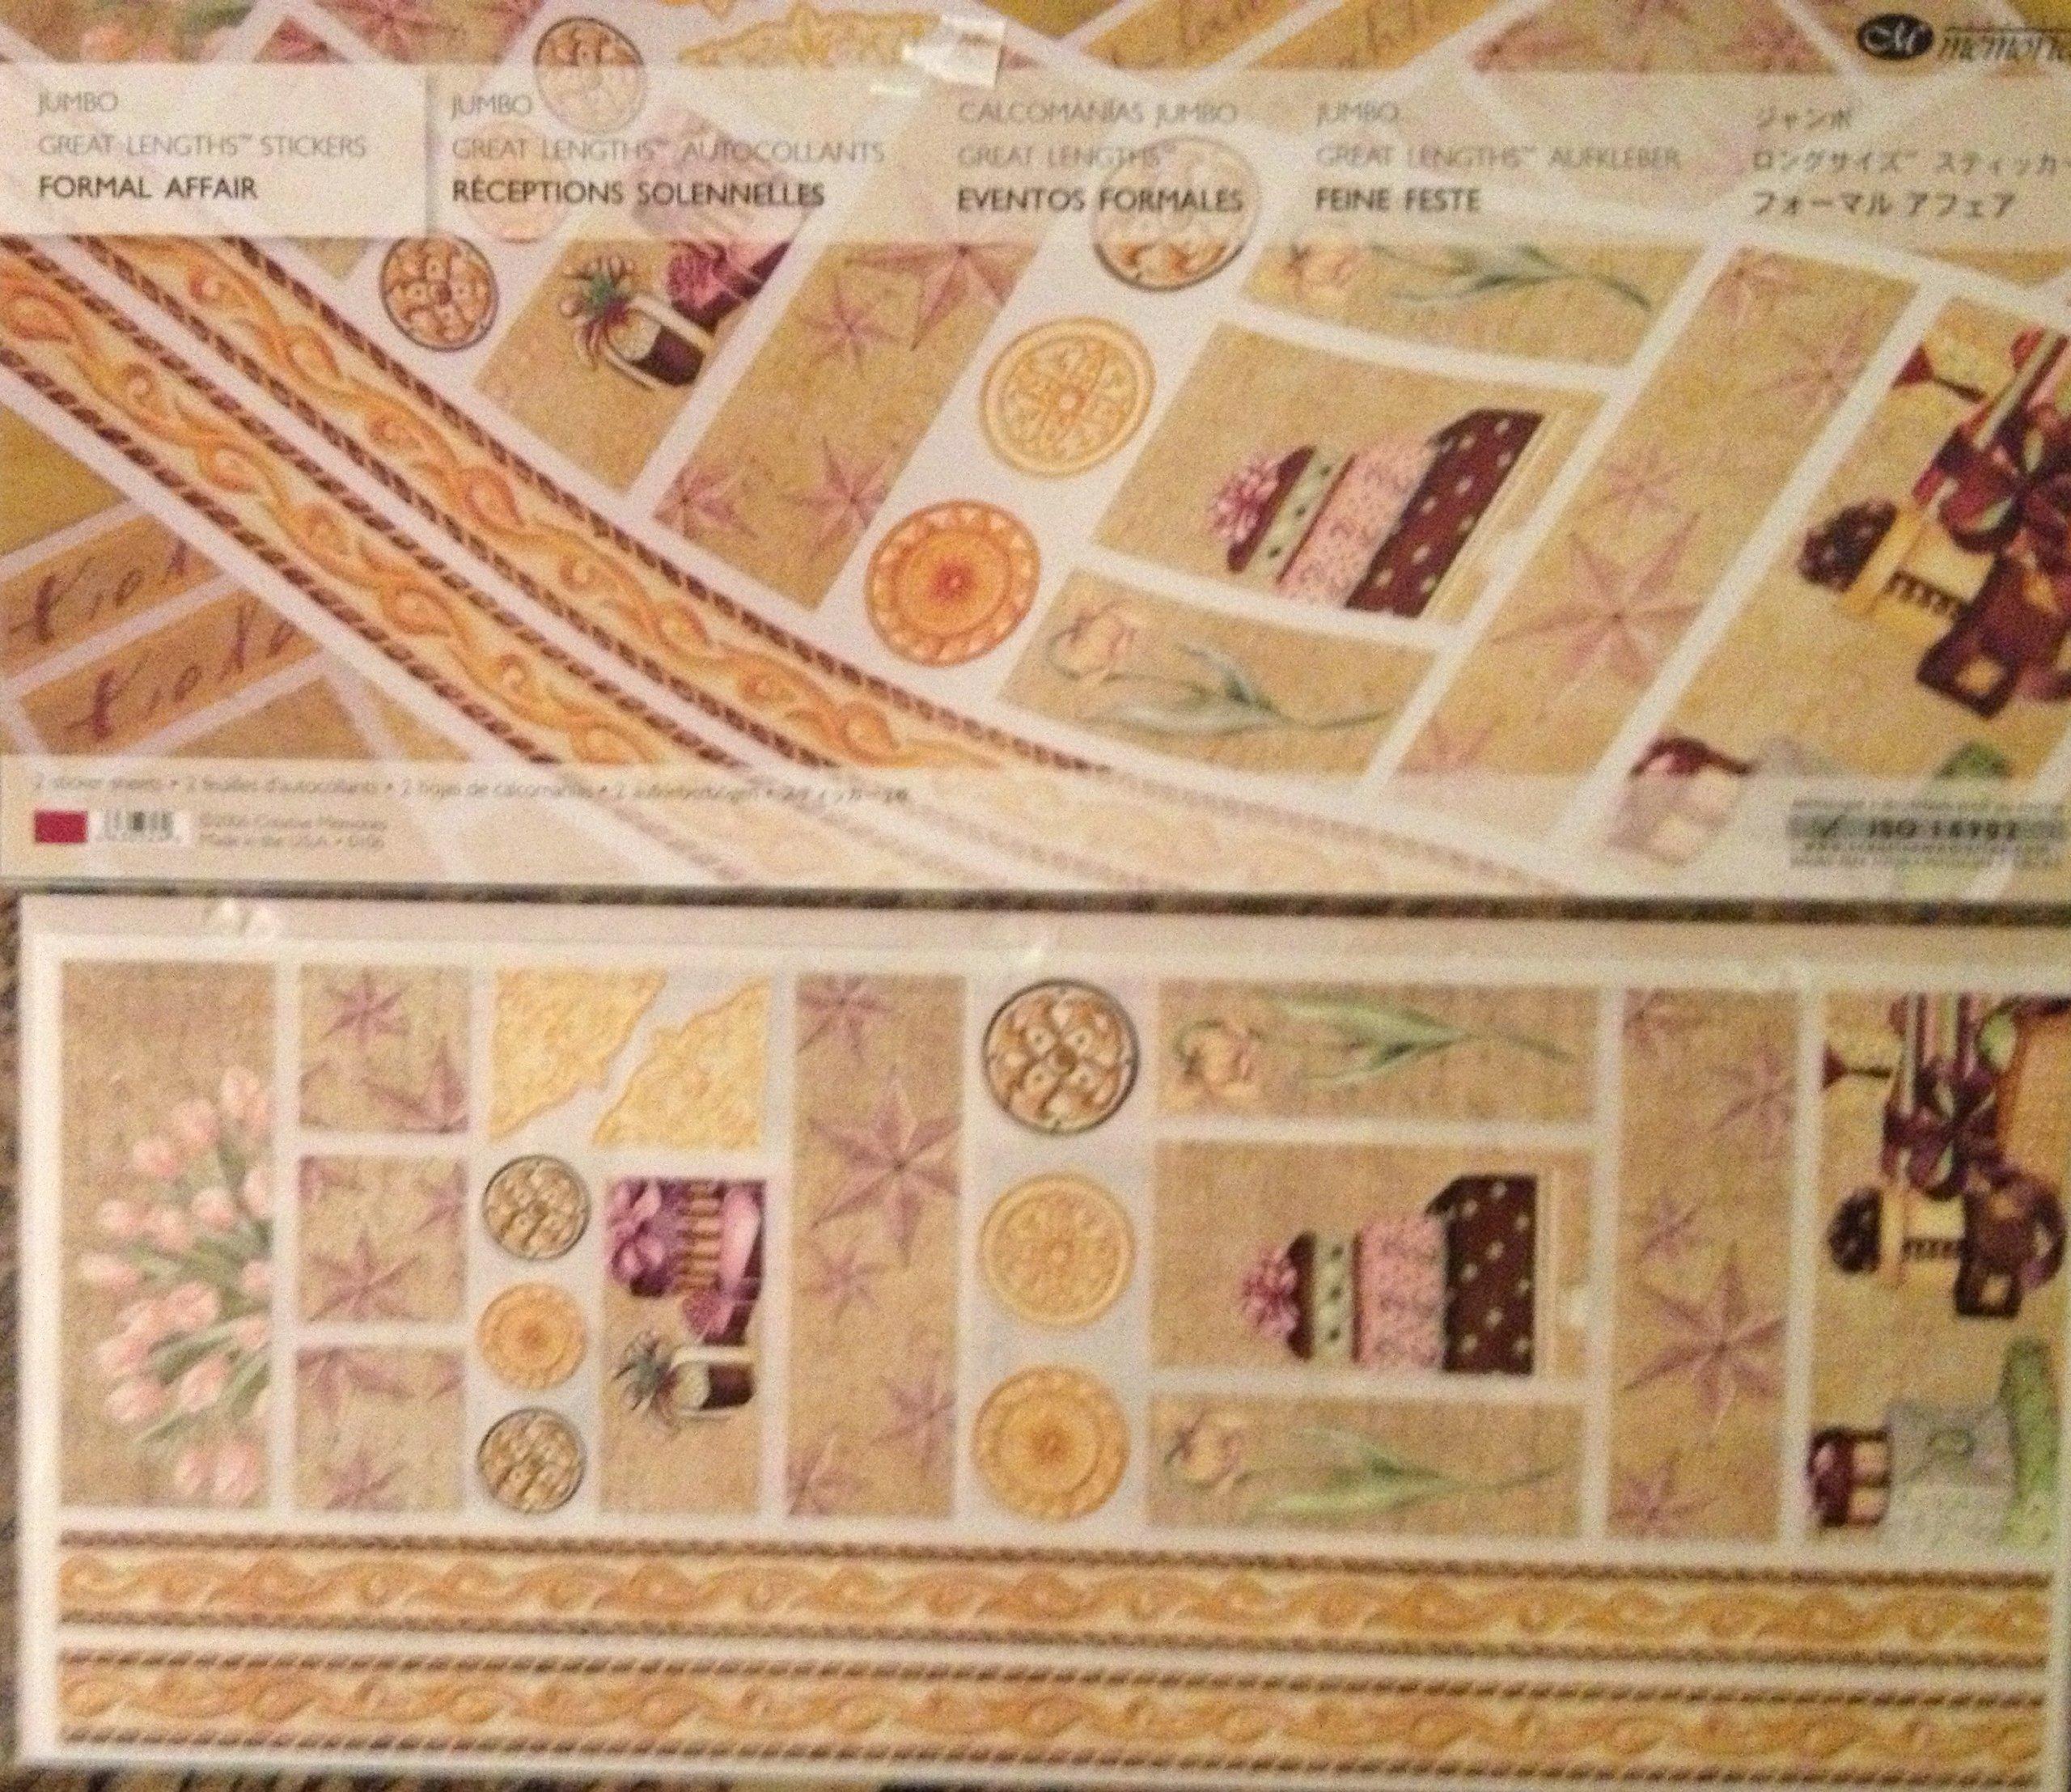 Jumbo Great Lengths Stickers: FORMAL AFFAIR